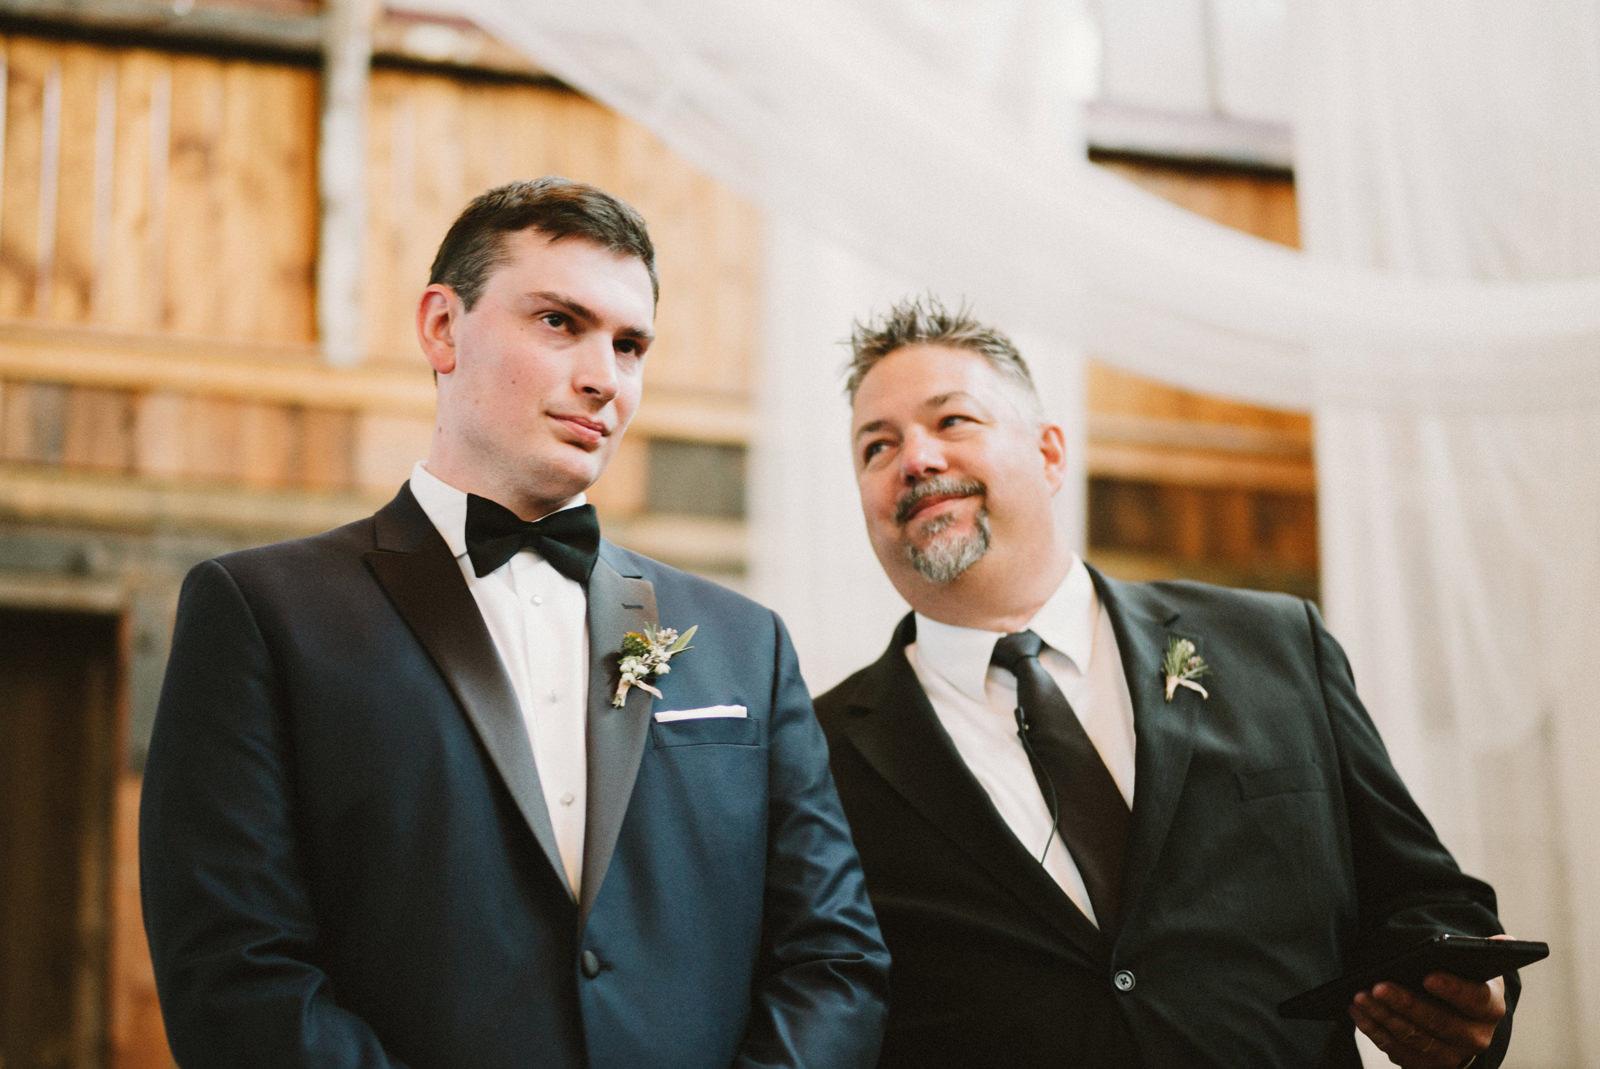 sodo-park-wedding-035 SODO PARK WEDDING